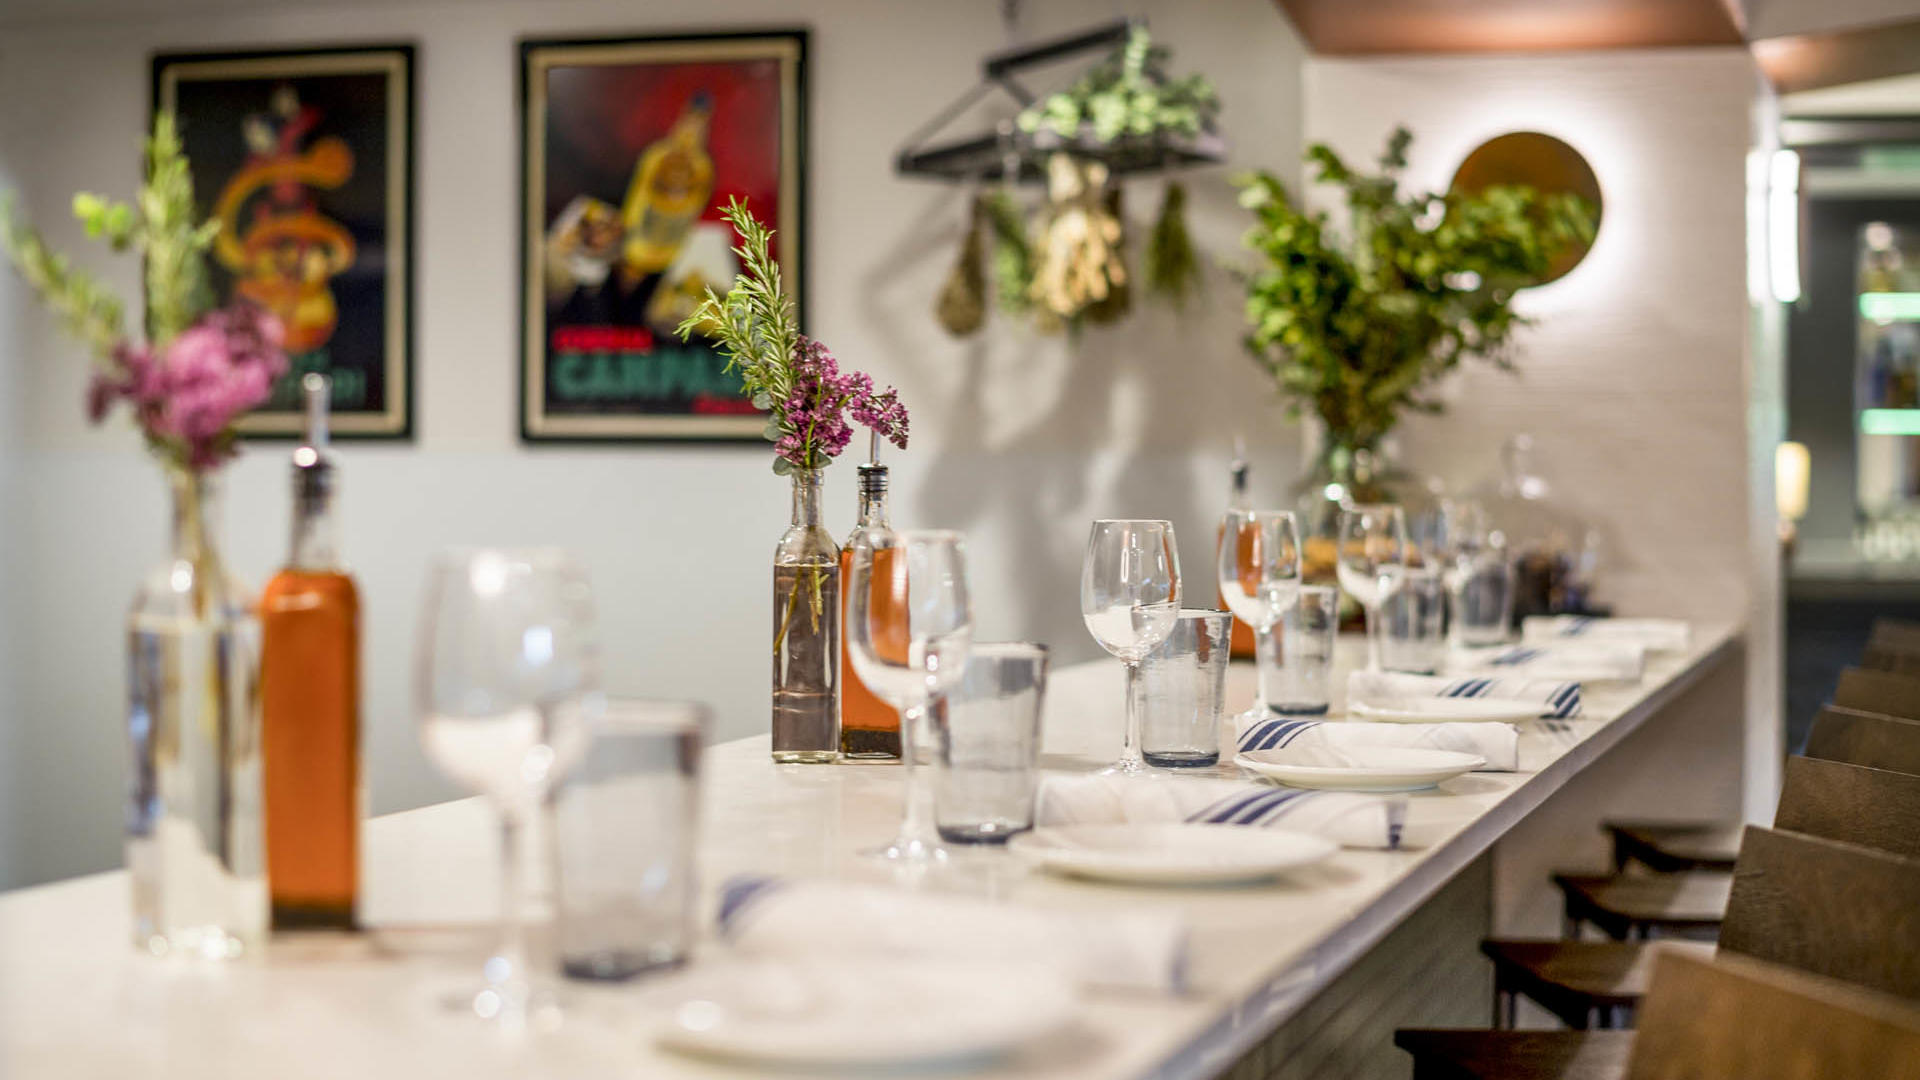 Gattara Restaurant High Table for Six People